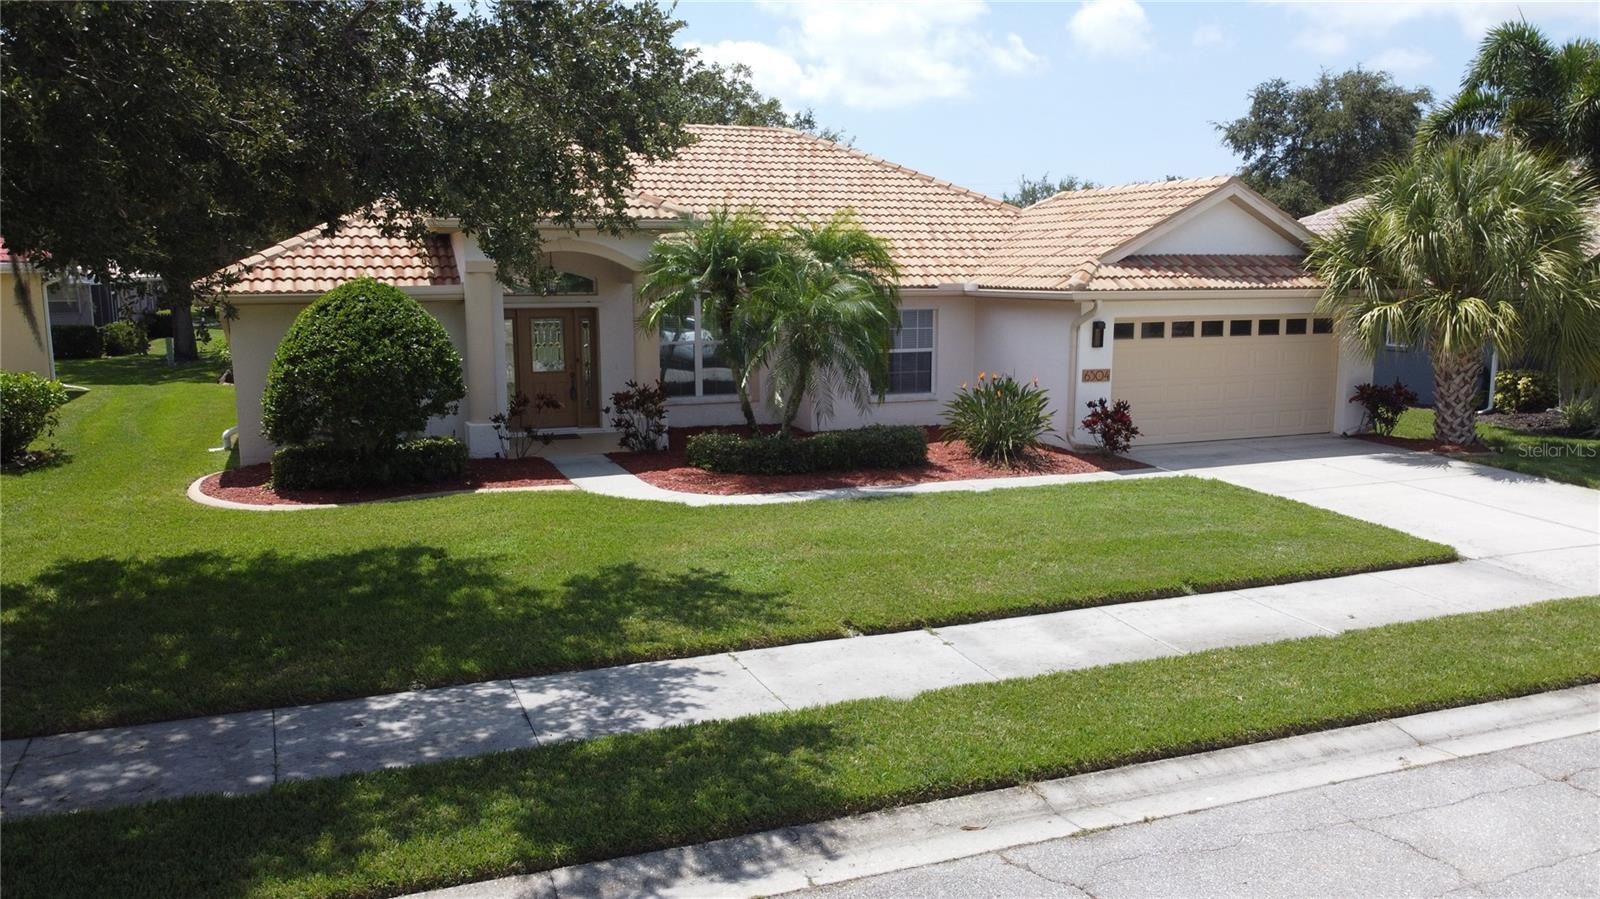 6504 DEER LAKE COURT, Sarasota, FL 34240 - #: A4512214